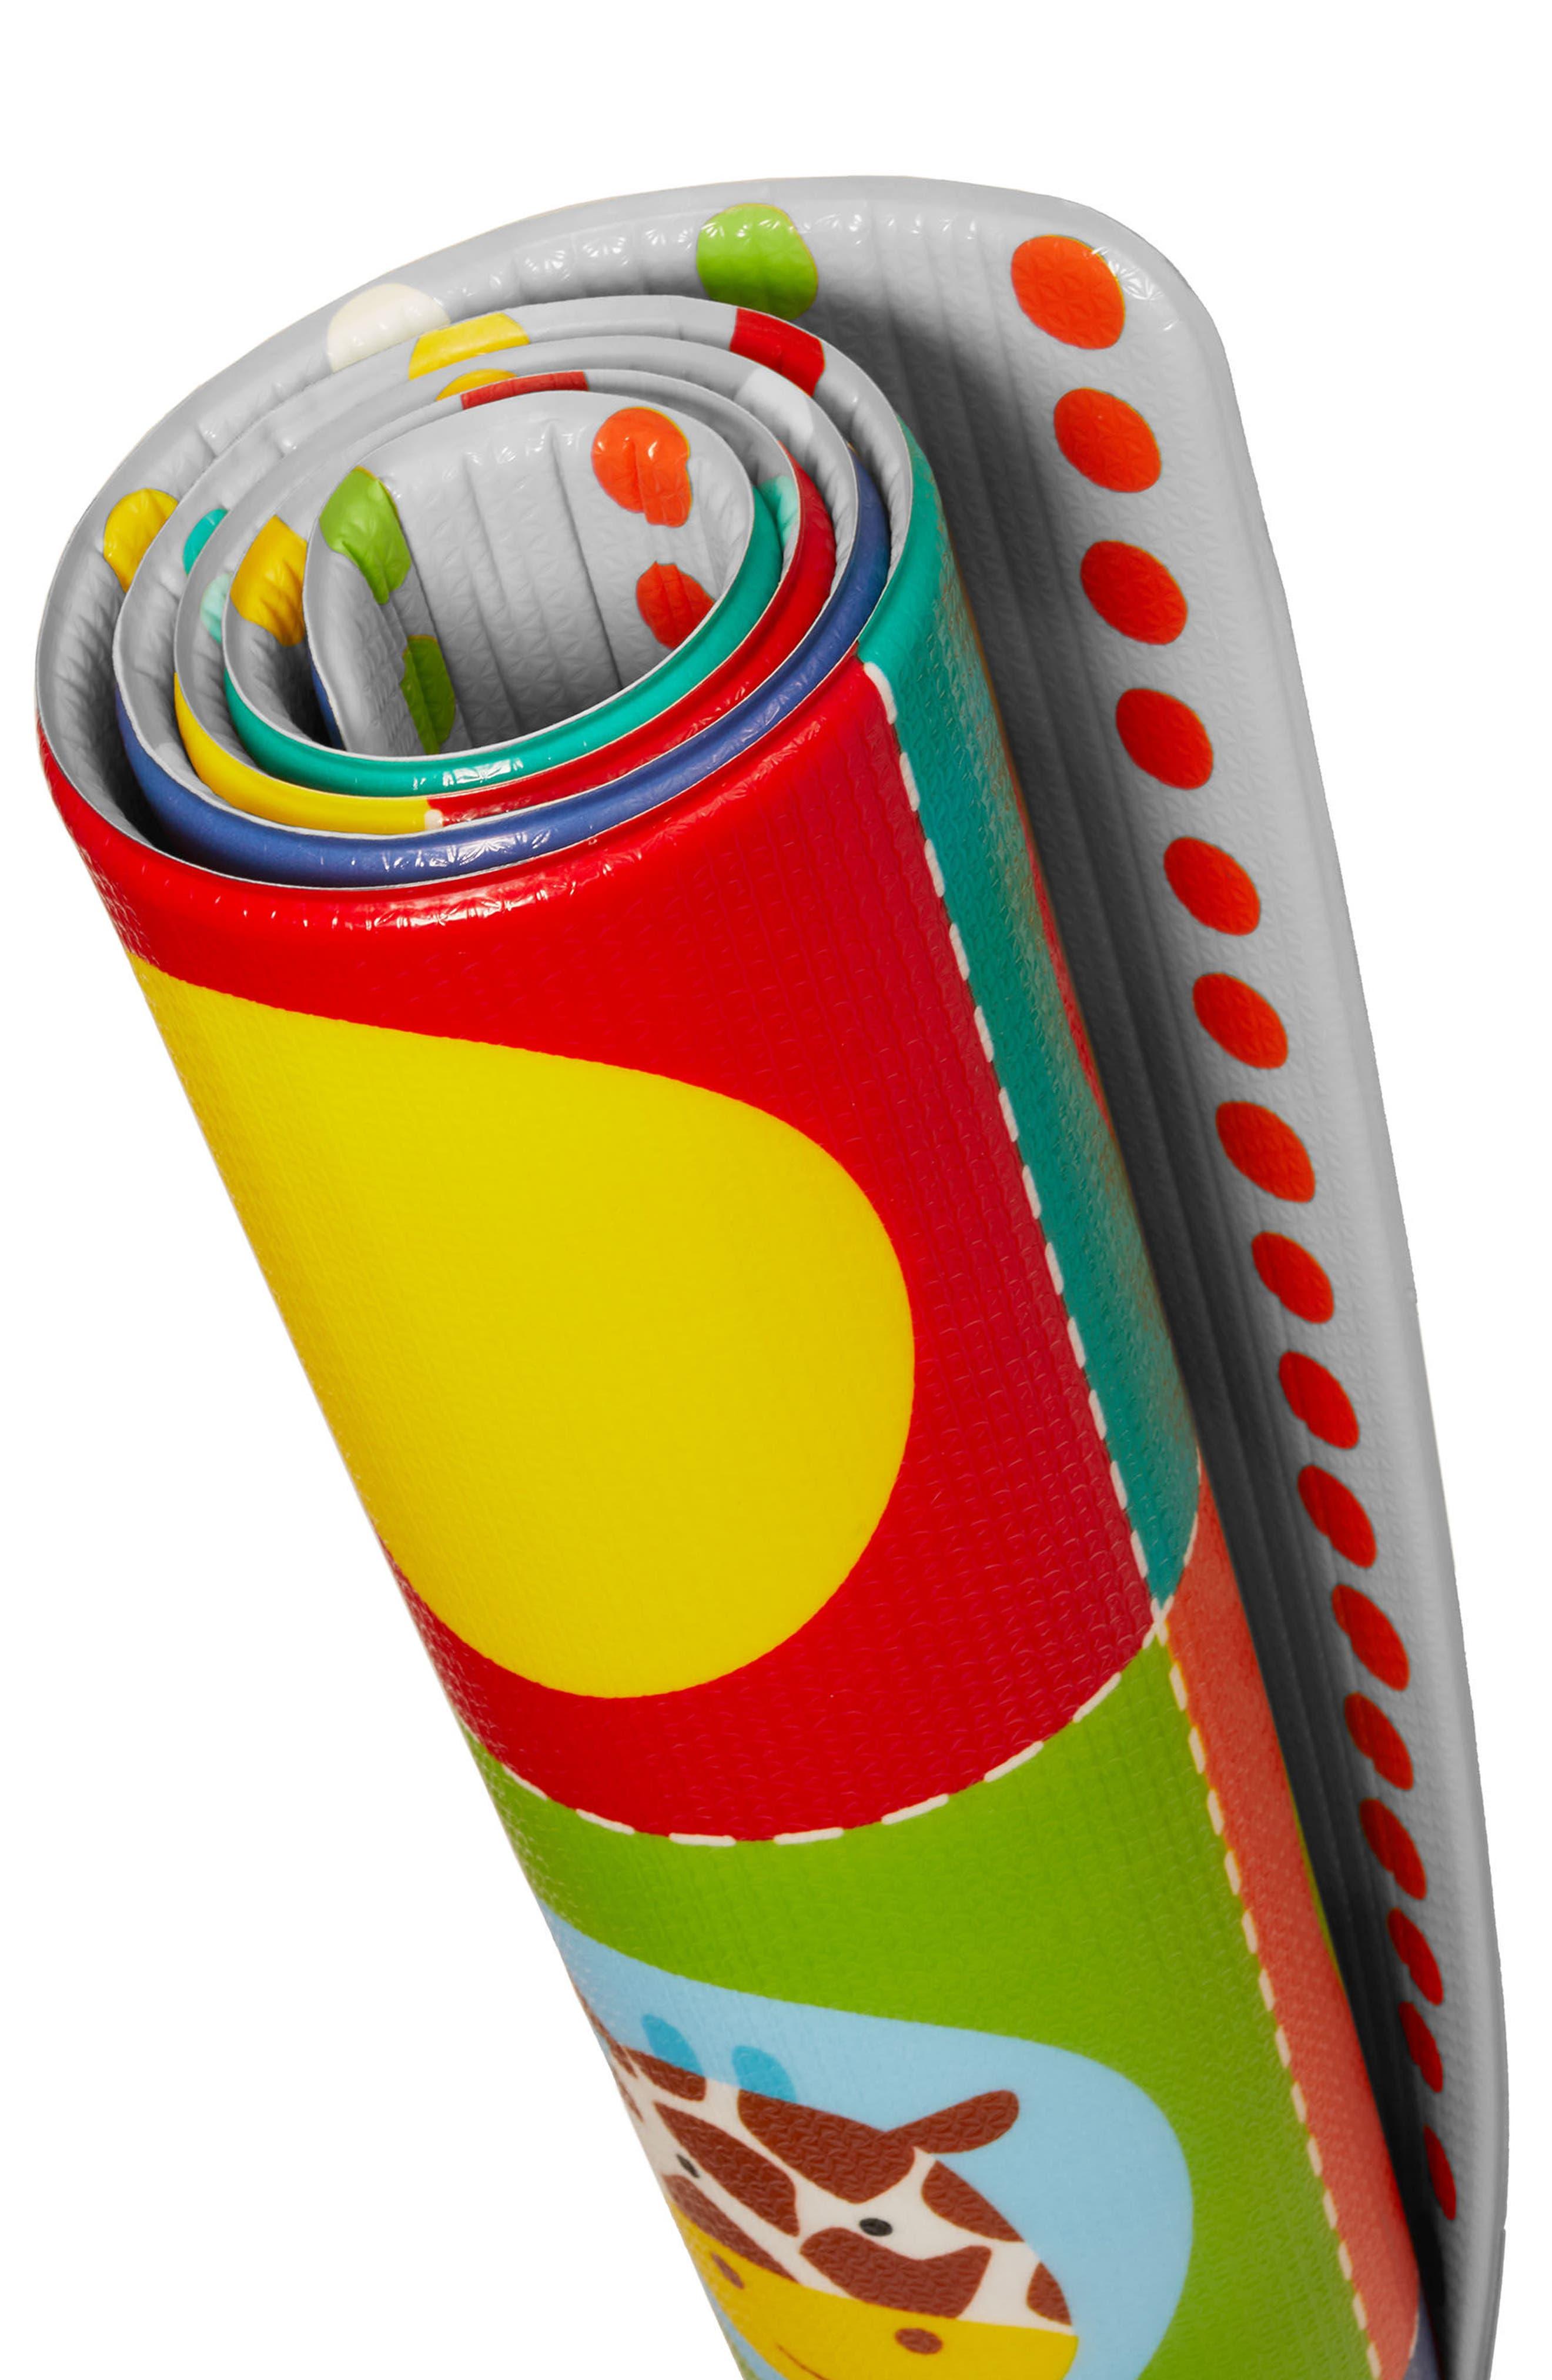 Zoo Reversible Jumbo Foam Playmat,                             Alternate thumbnail 2, color,                             600